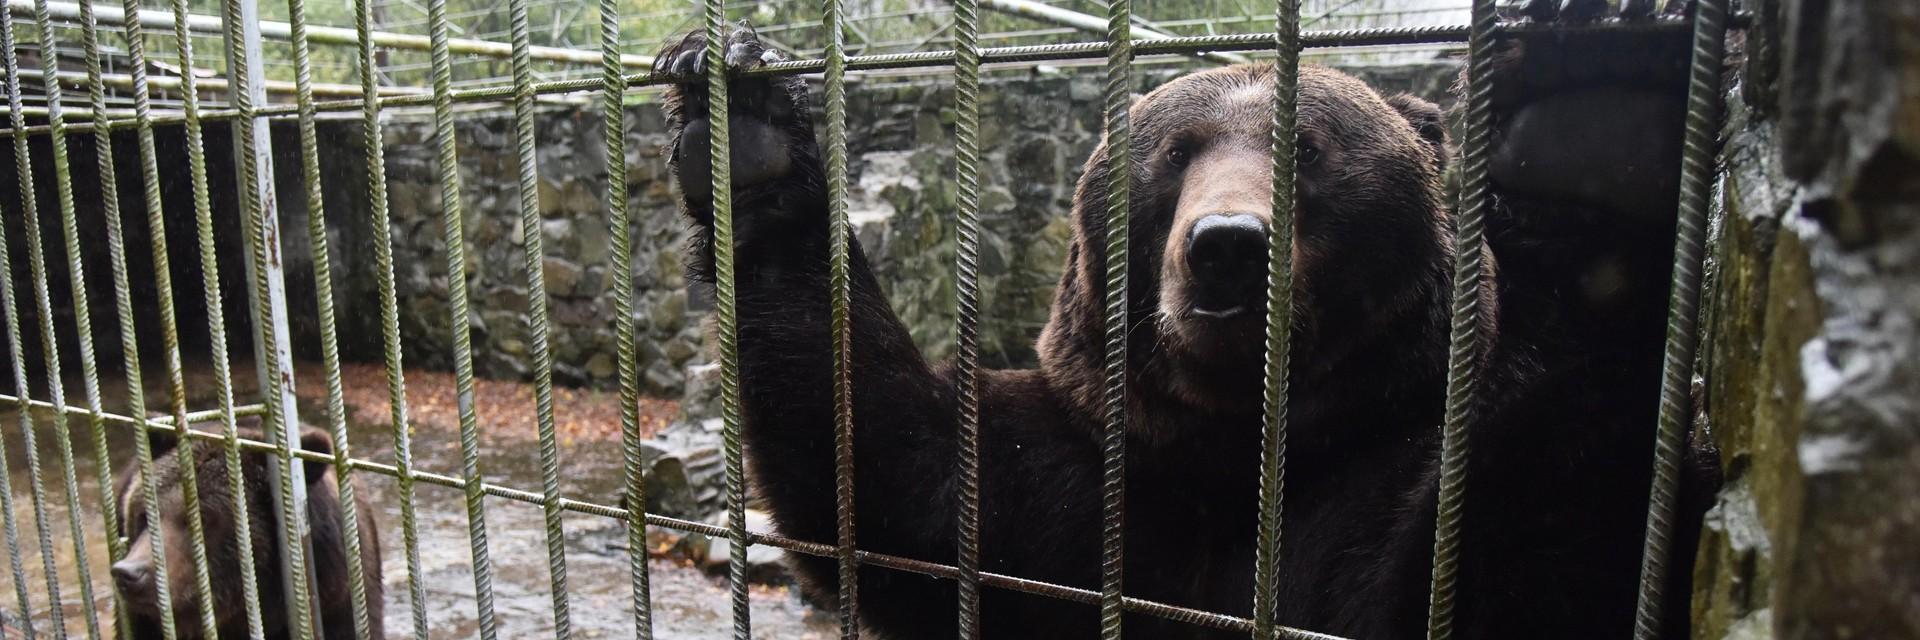 Bears behind bars